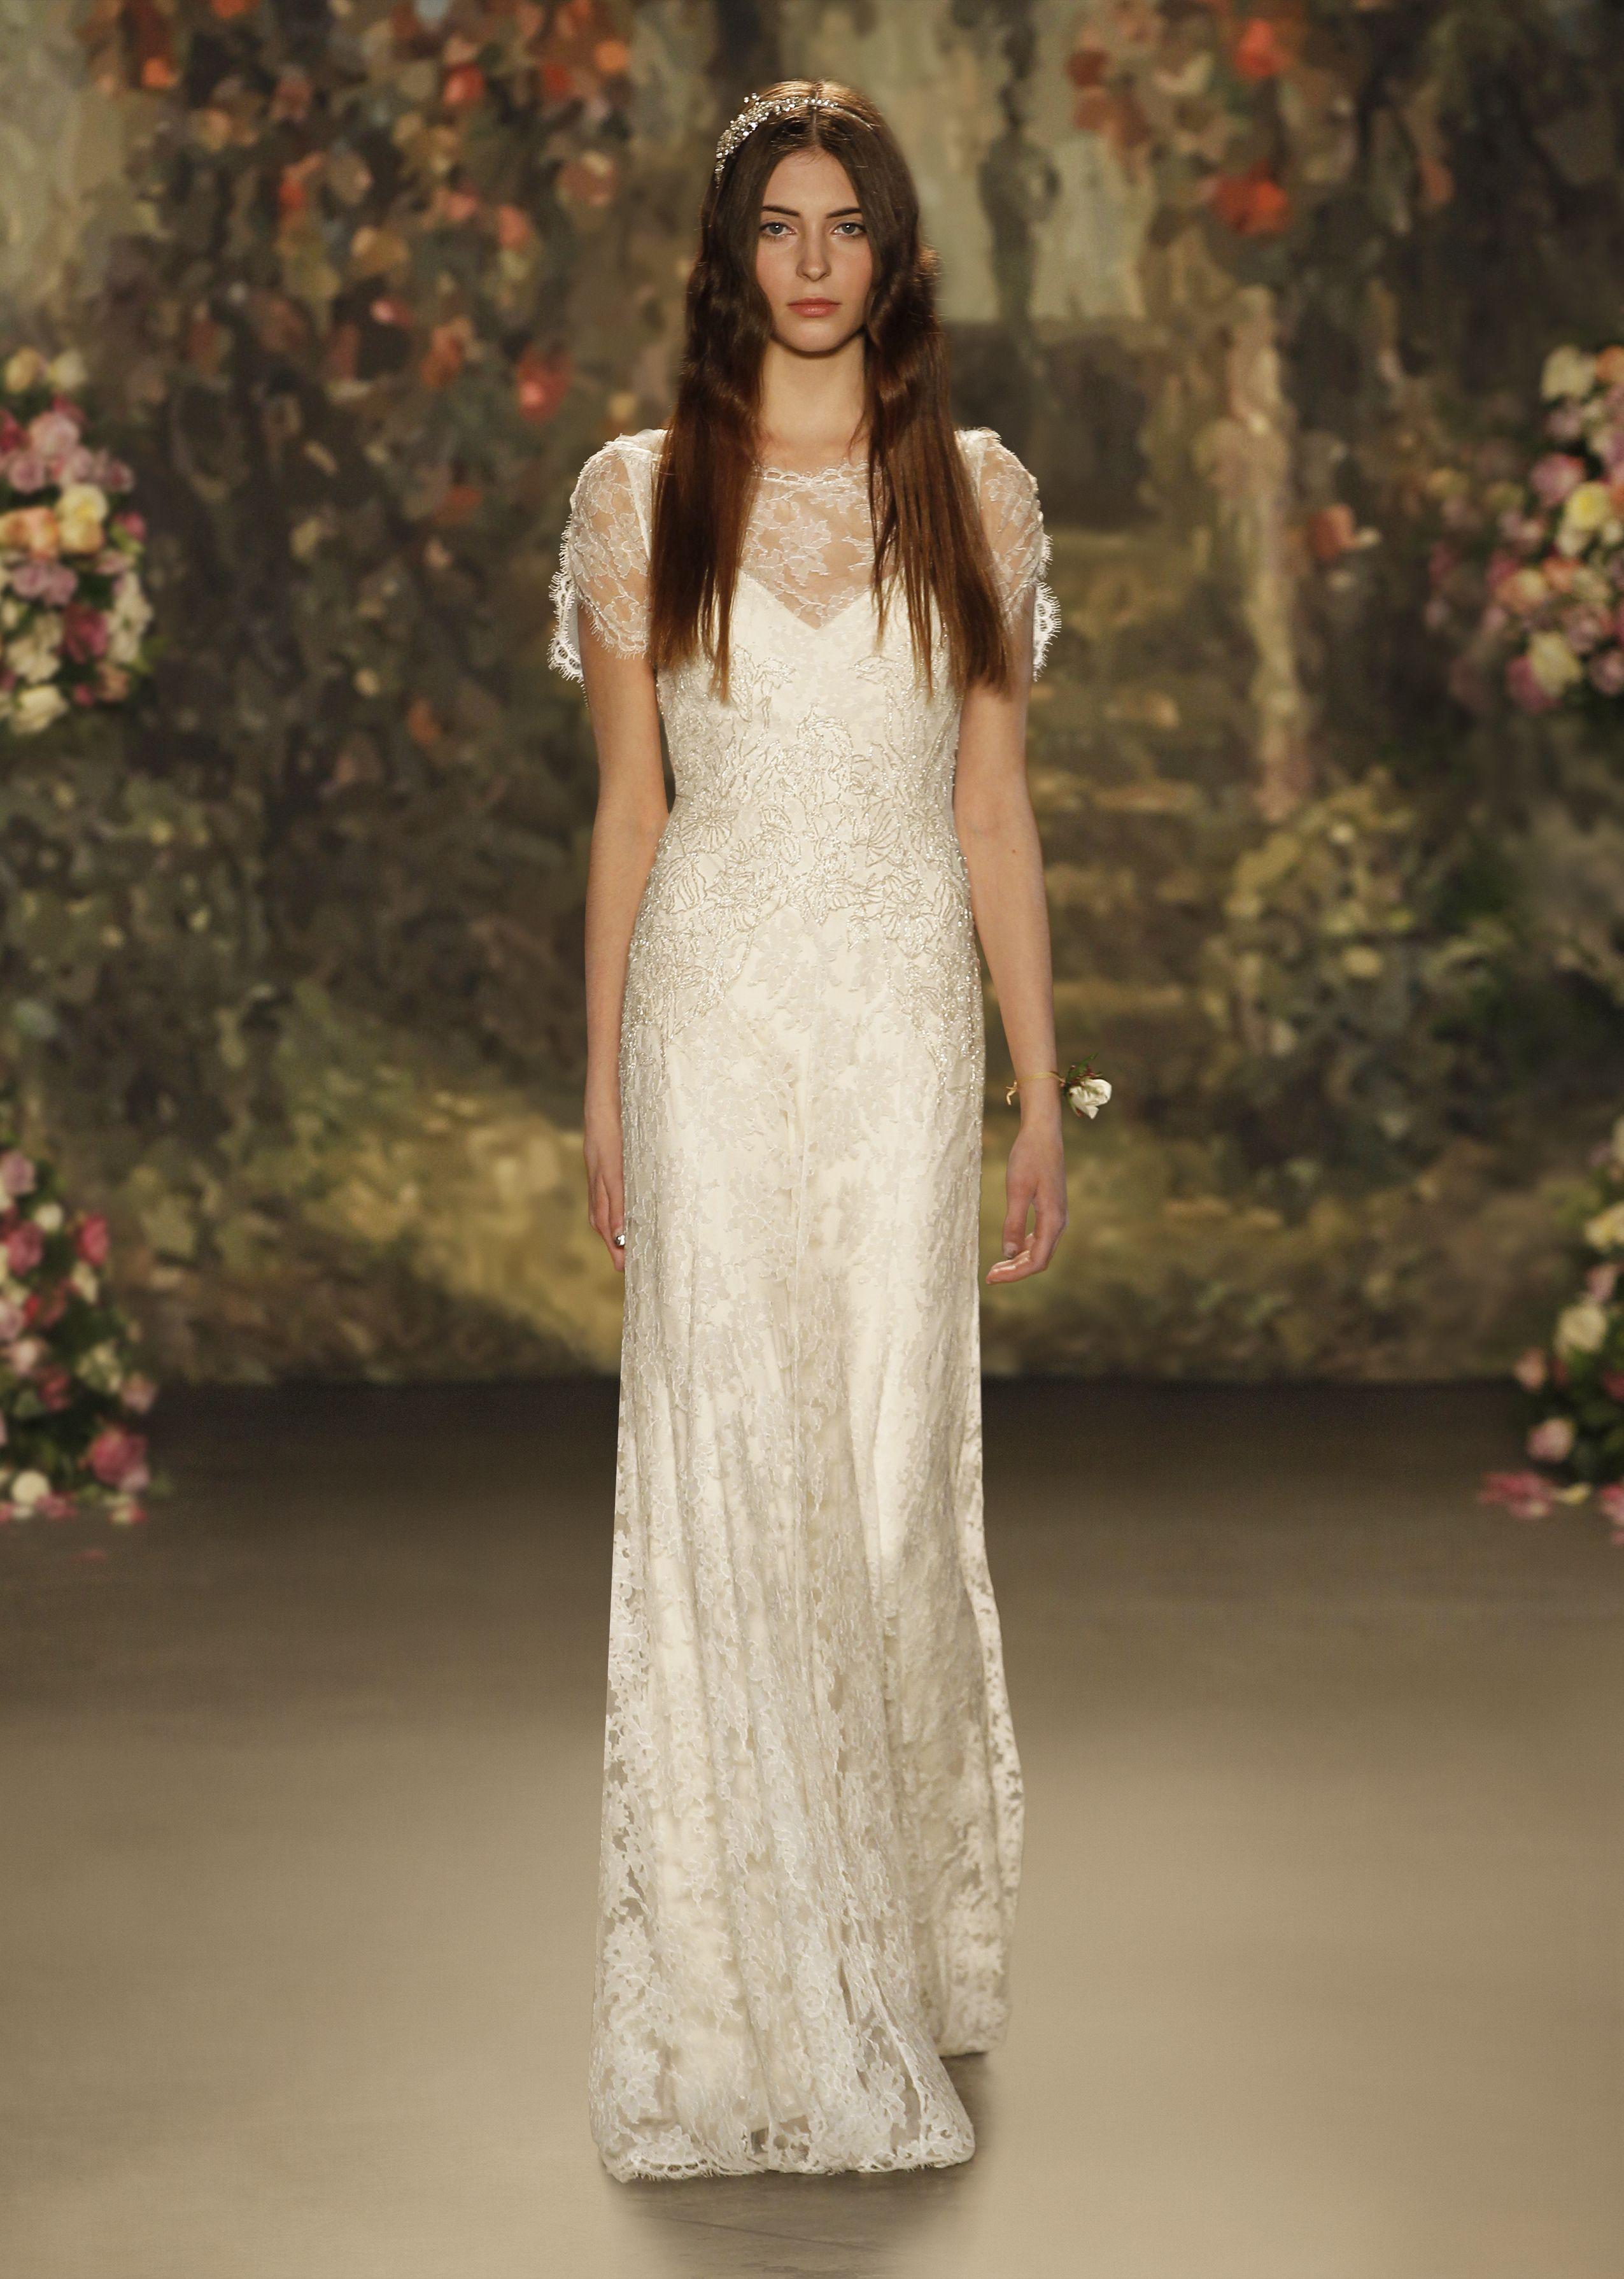 Venetia by Jenny Packham at The Bridal Collection Harrogate  6c38dea3ad74